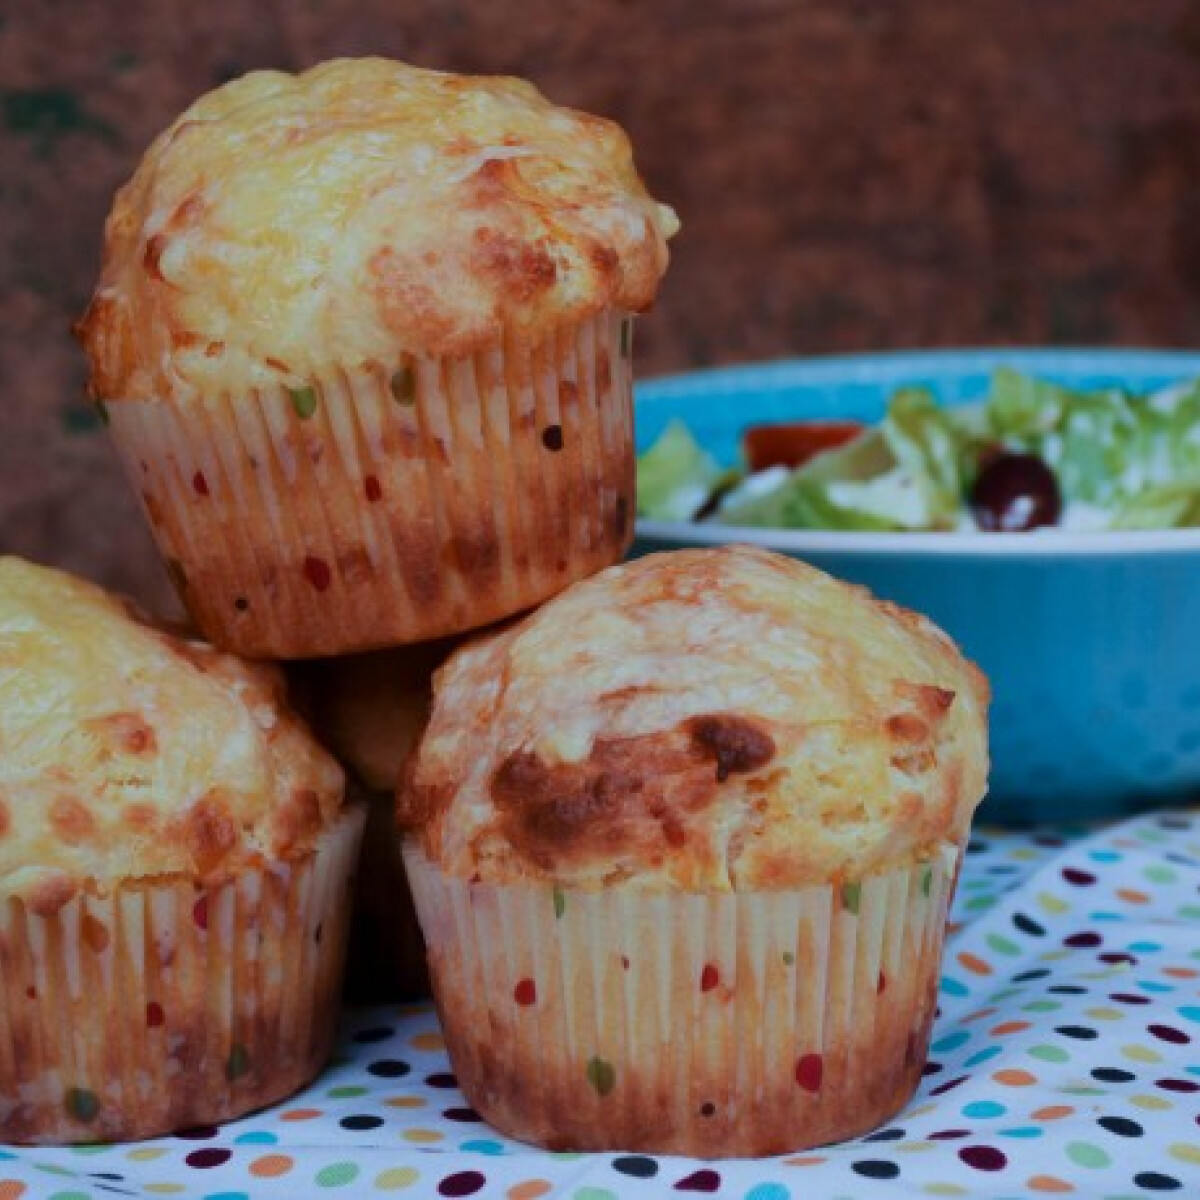 Ezen a képen: Kétsajtos muffin